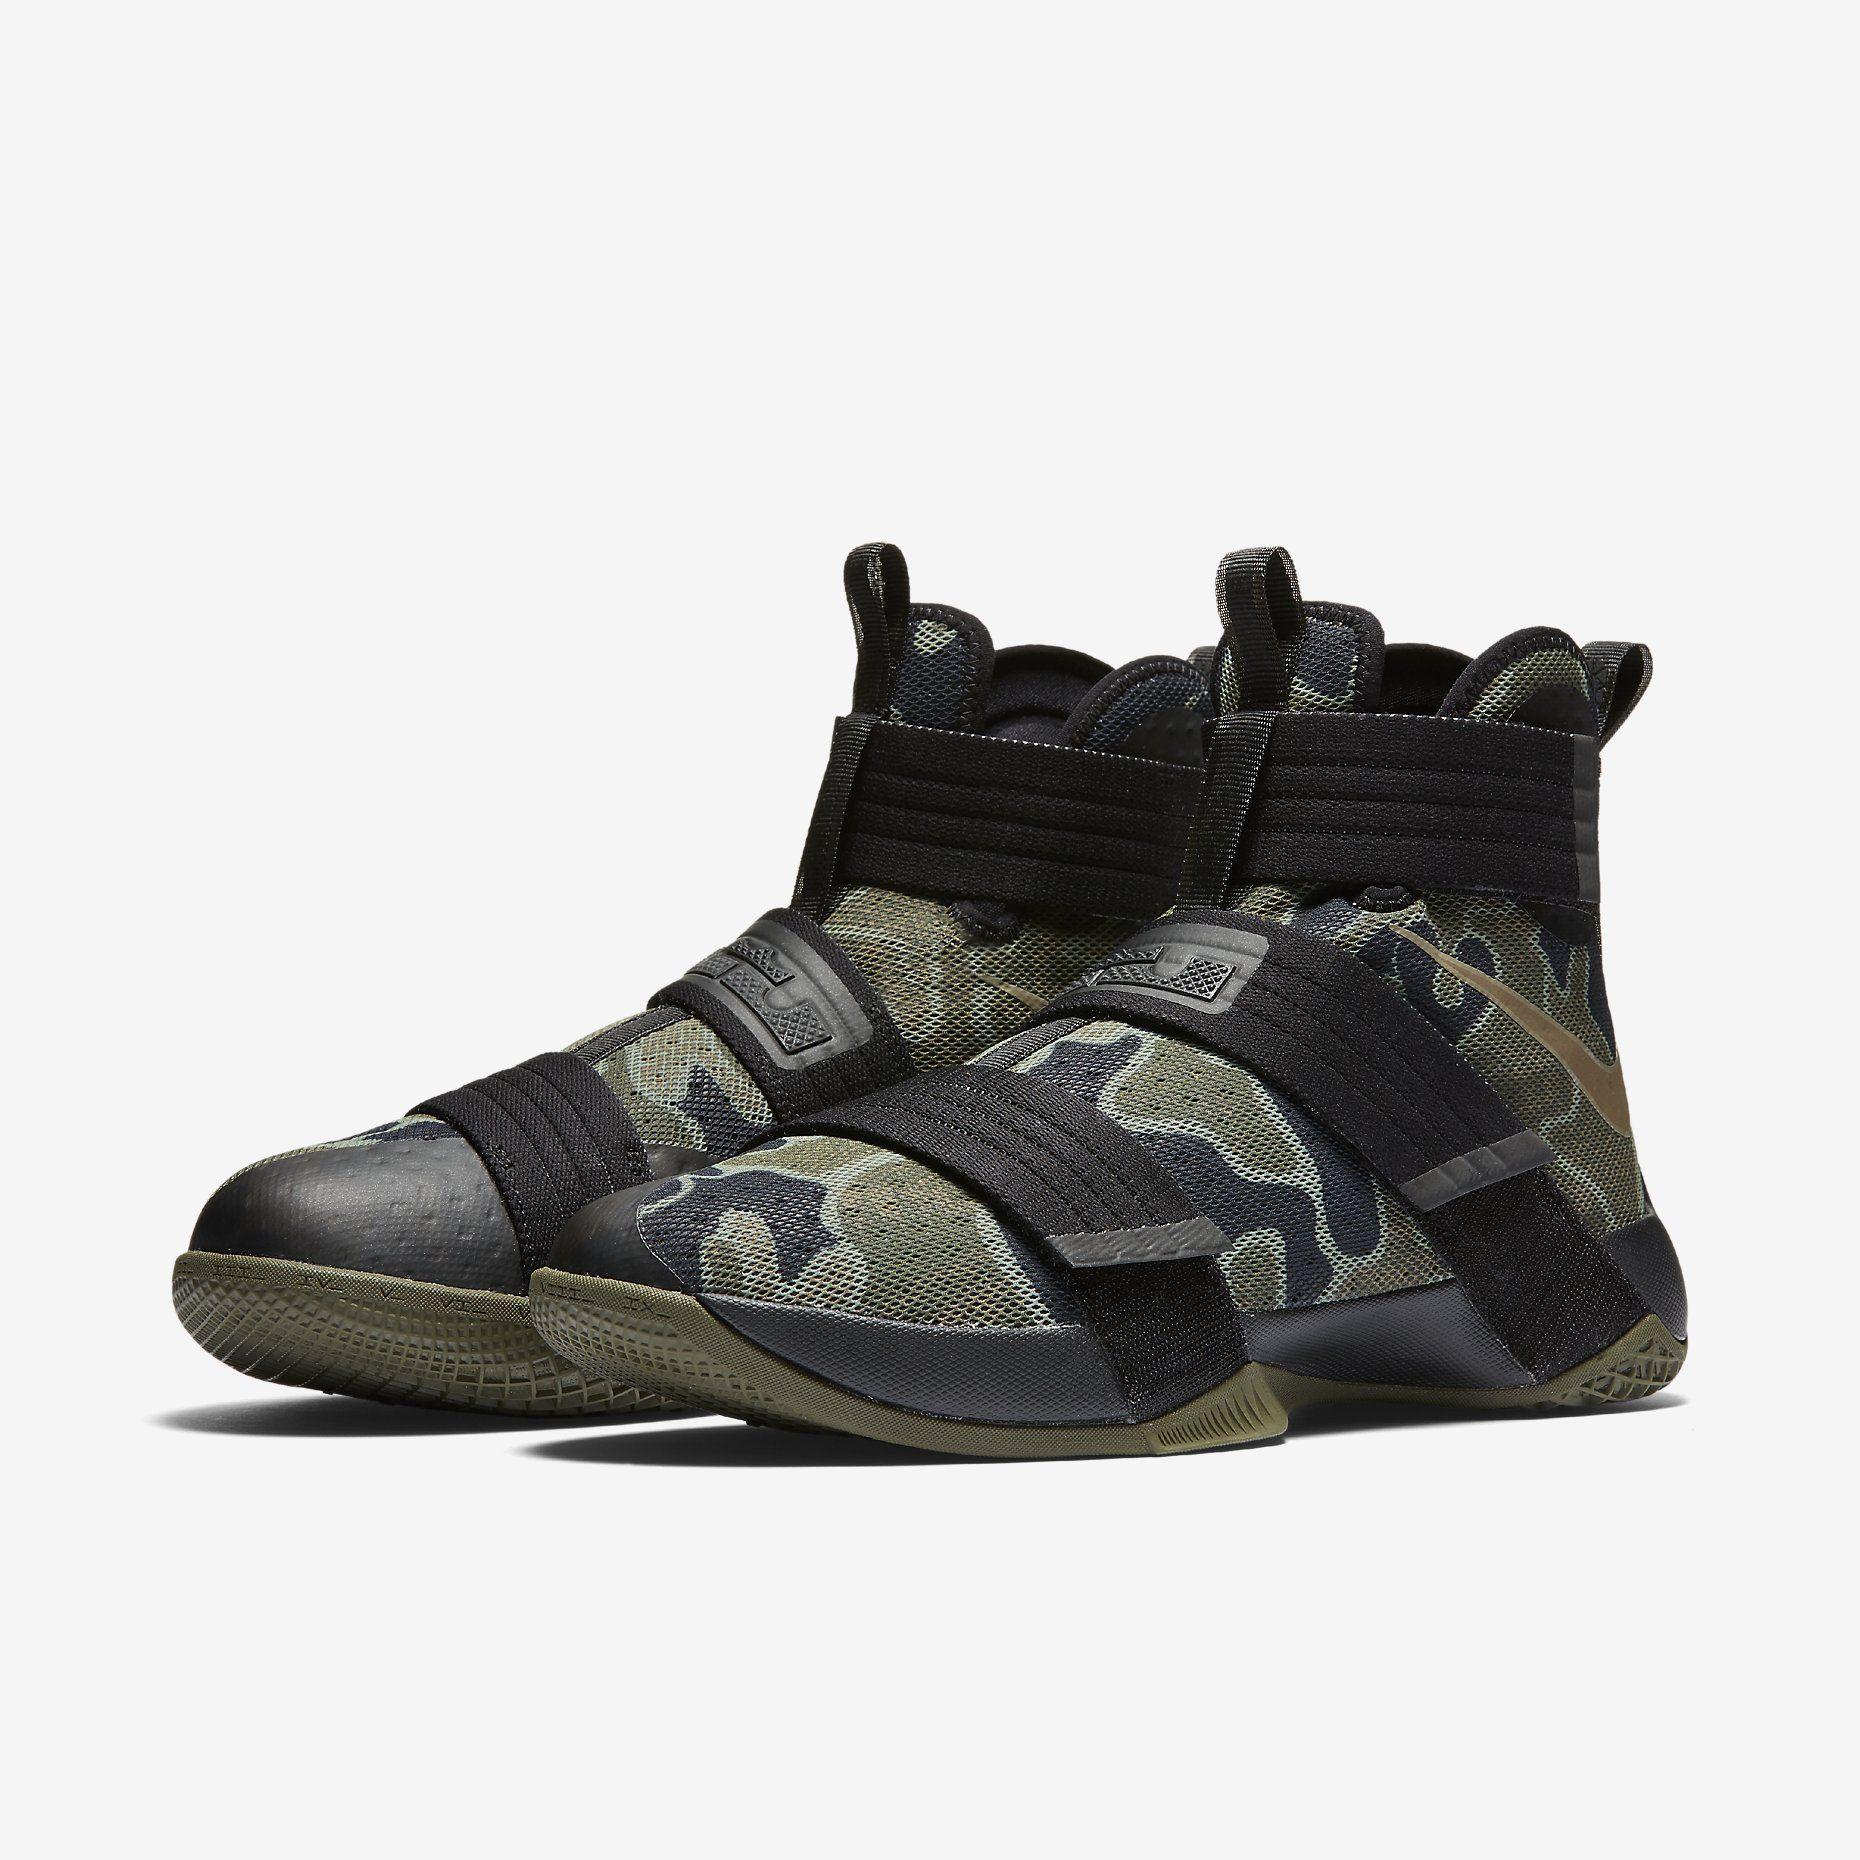 a4888b8cb015 Nike LeBron Zoom Soldier 10 SFG - Black Medium Olive Bamboo